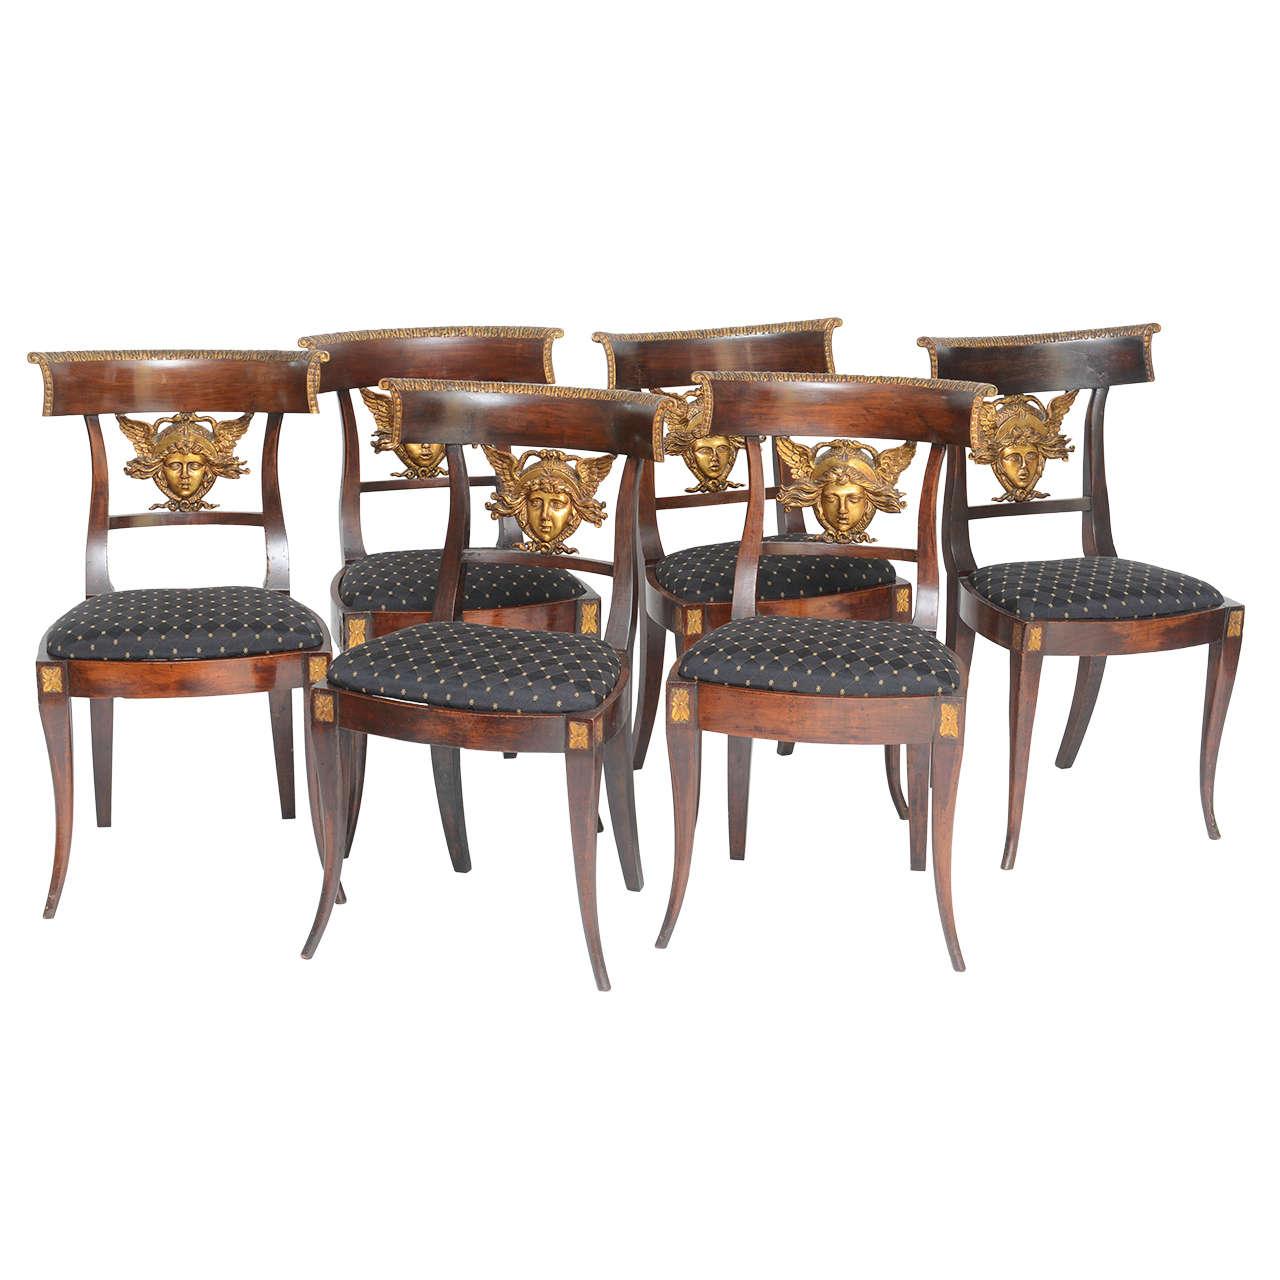 Set of Six Italian Neoclassical Klismos Medusa Head Side Chairs, circa 1810-1820